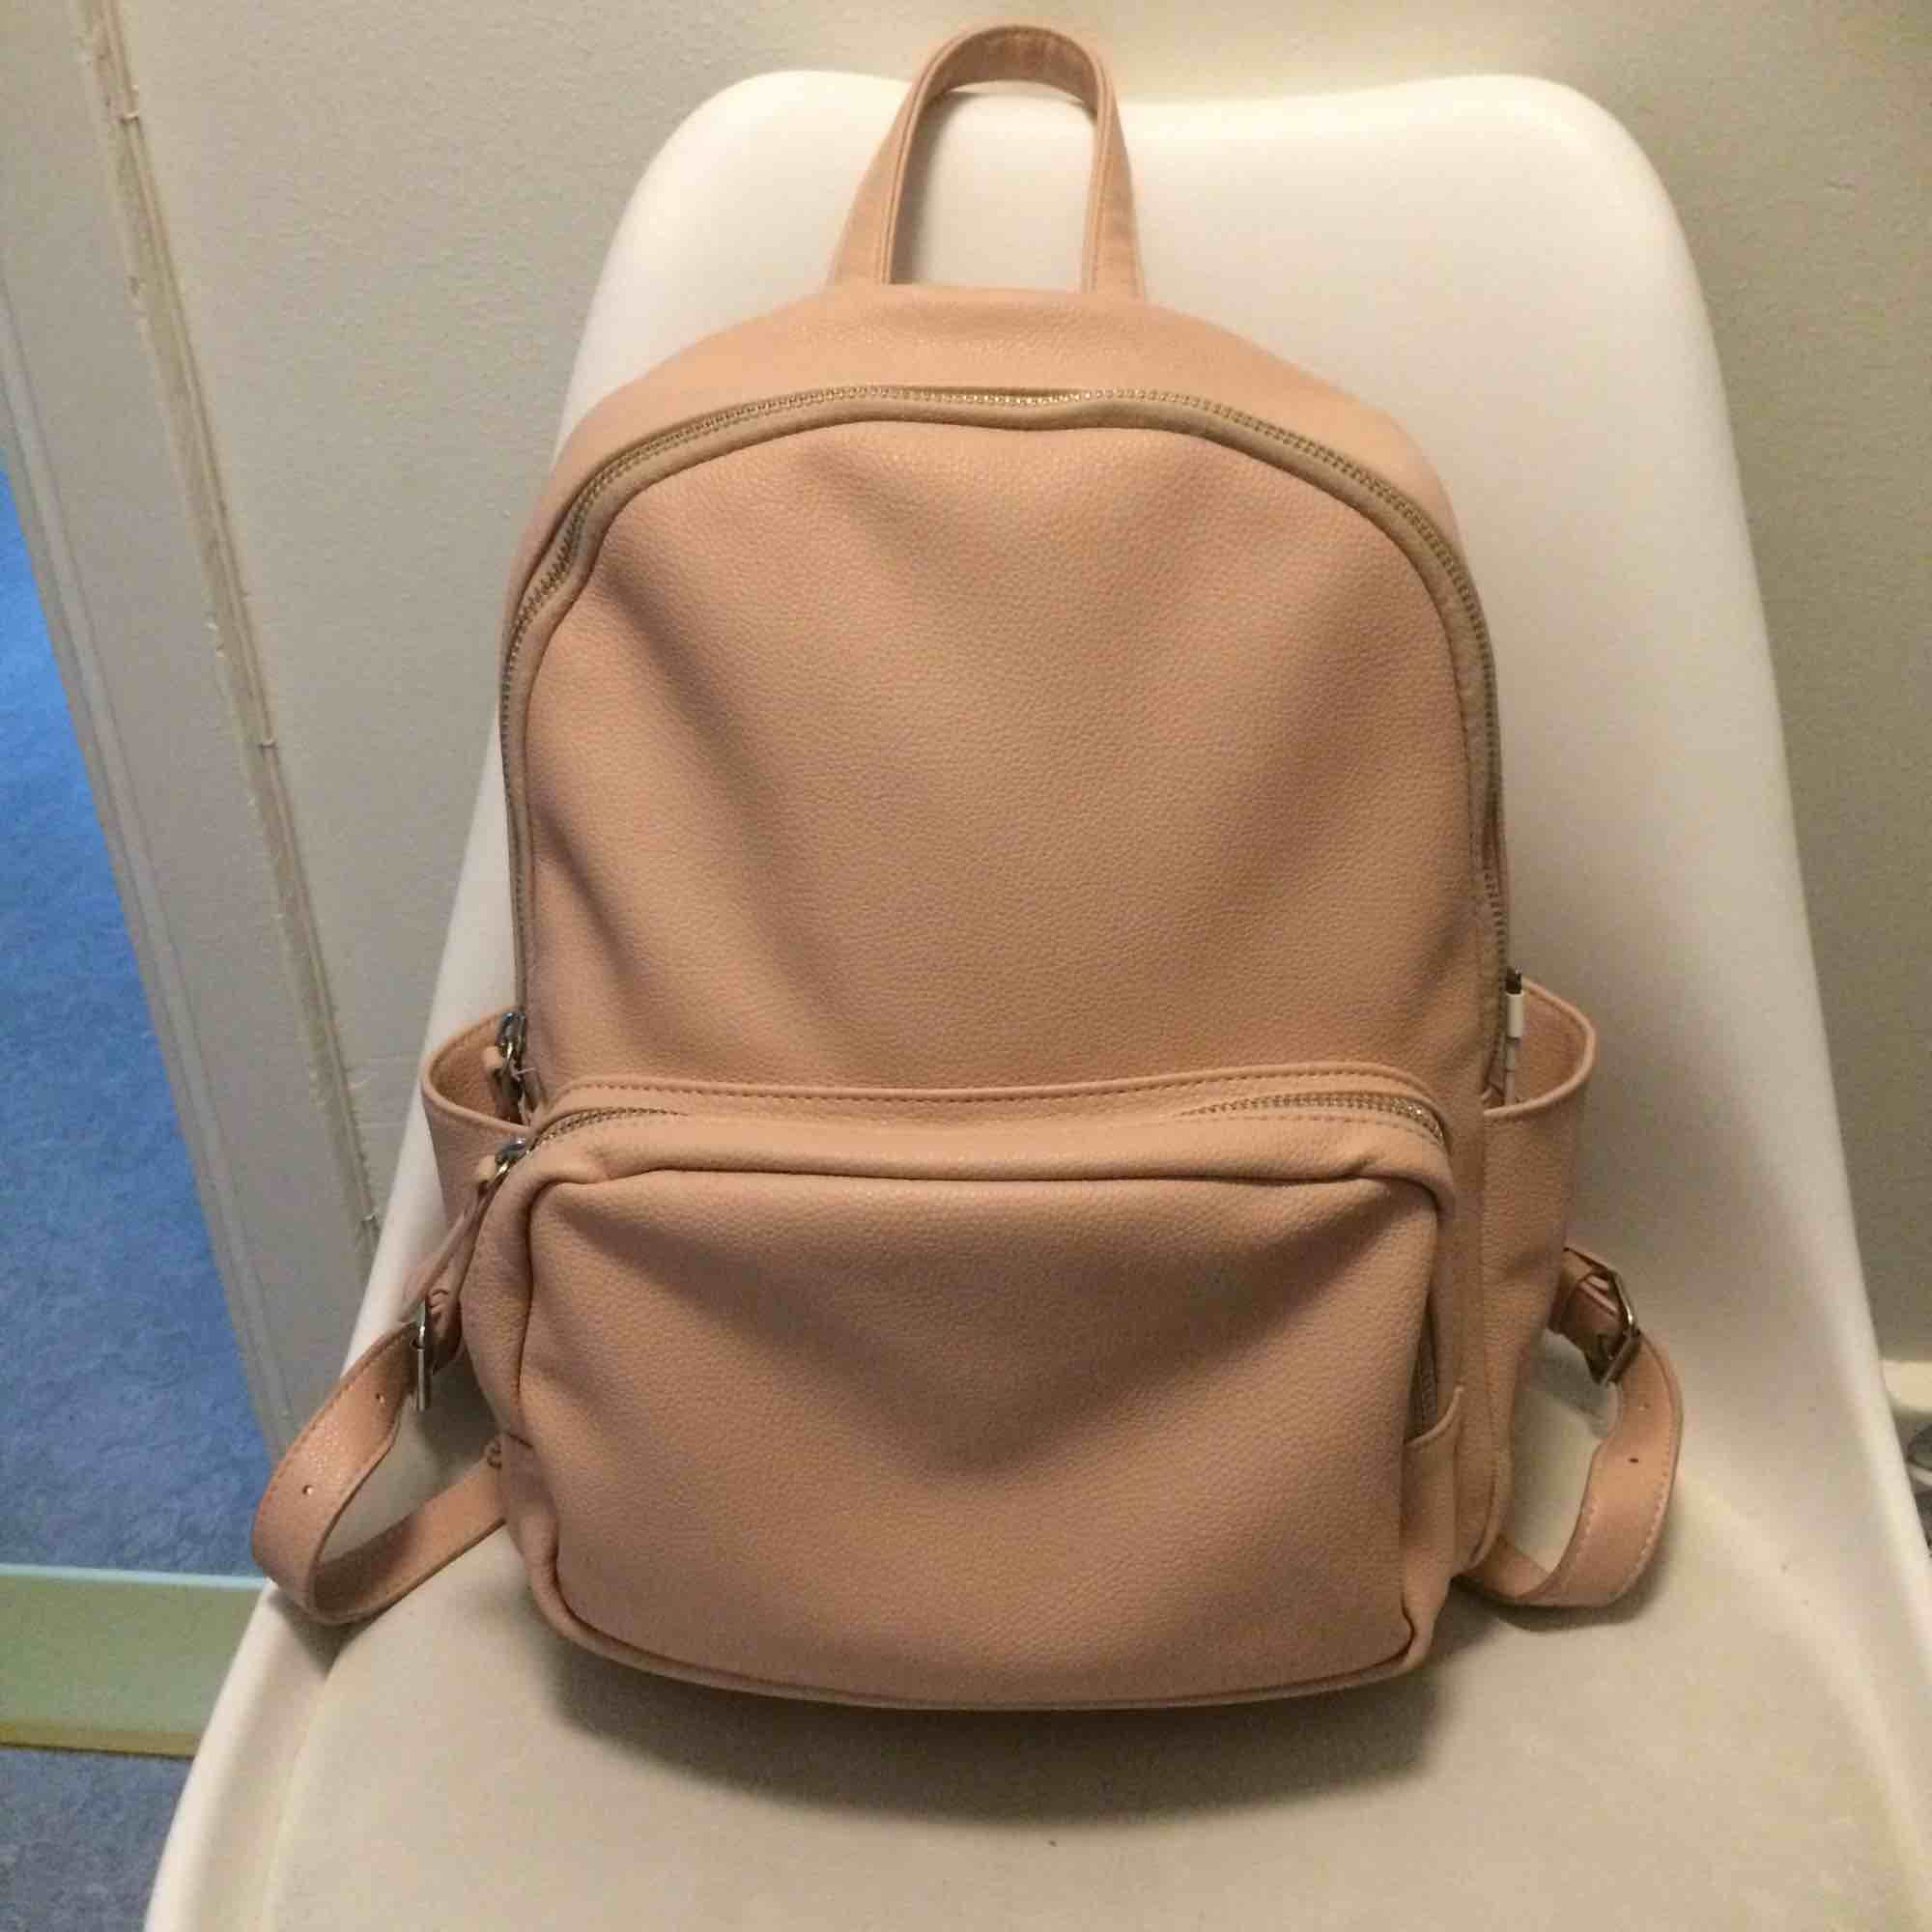 Dusty pink ryggsäck i fint skick! Passa som datorväska oxå!. Accessoarer.